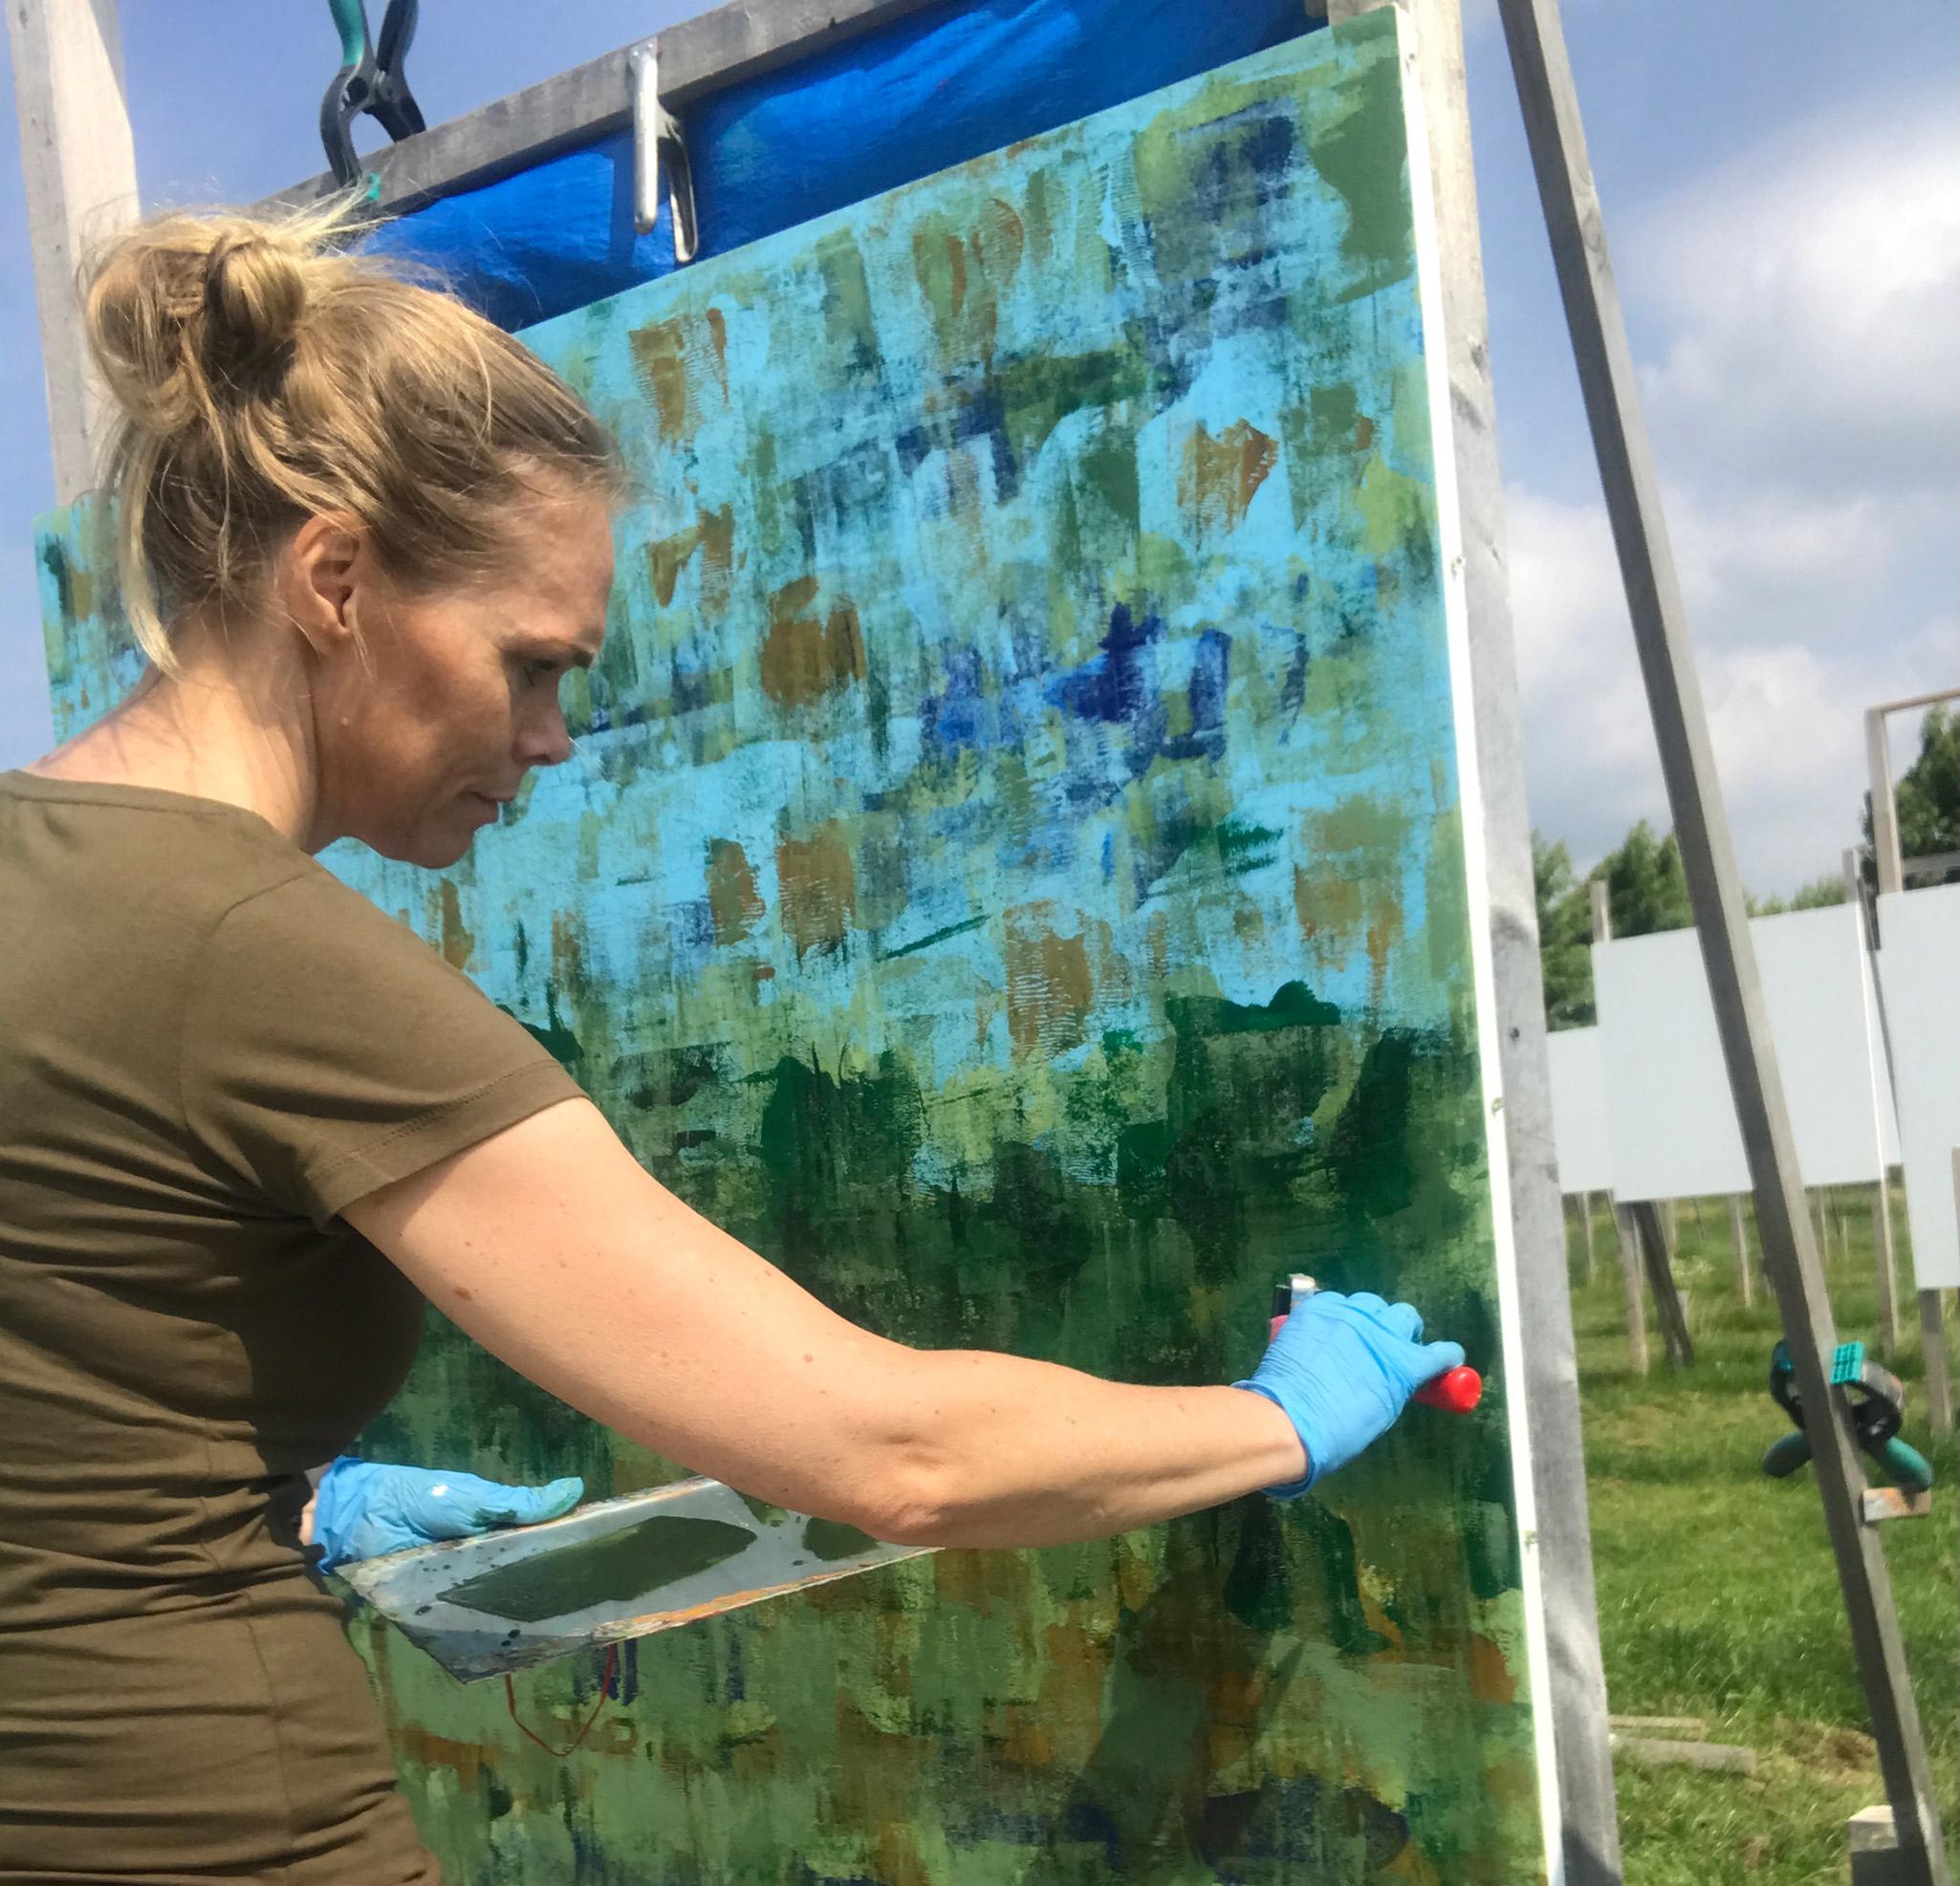 Elise Eekhout | The Colorfield Performance | journal